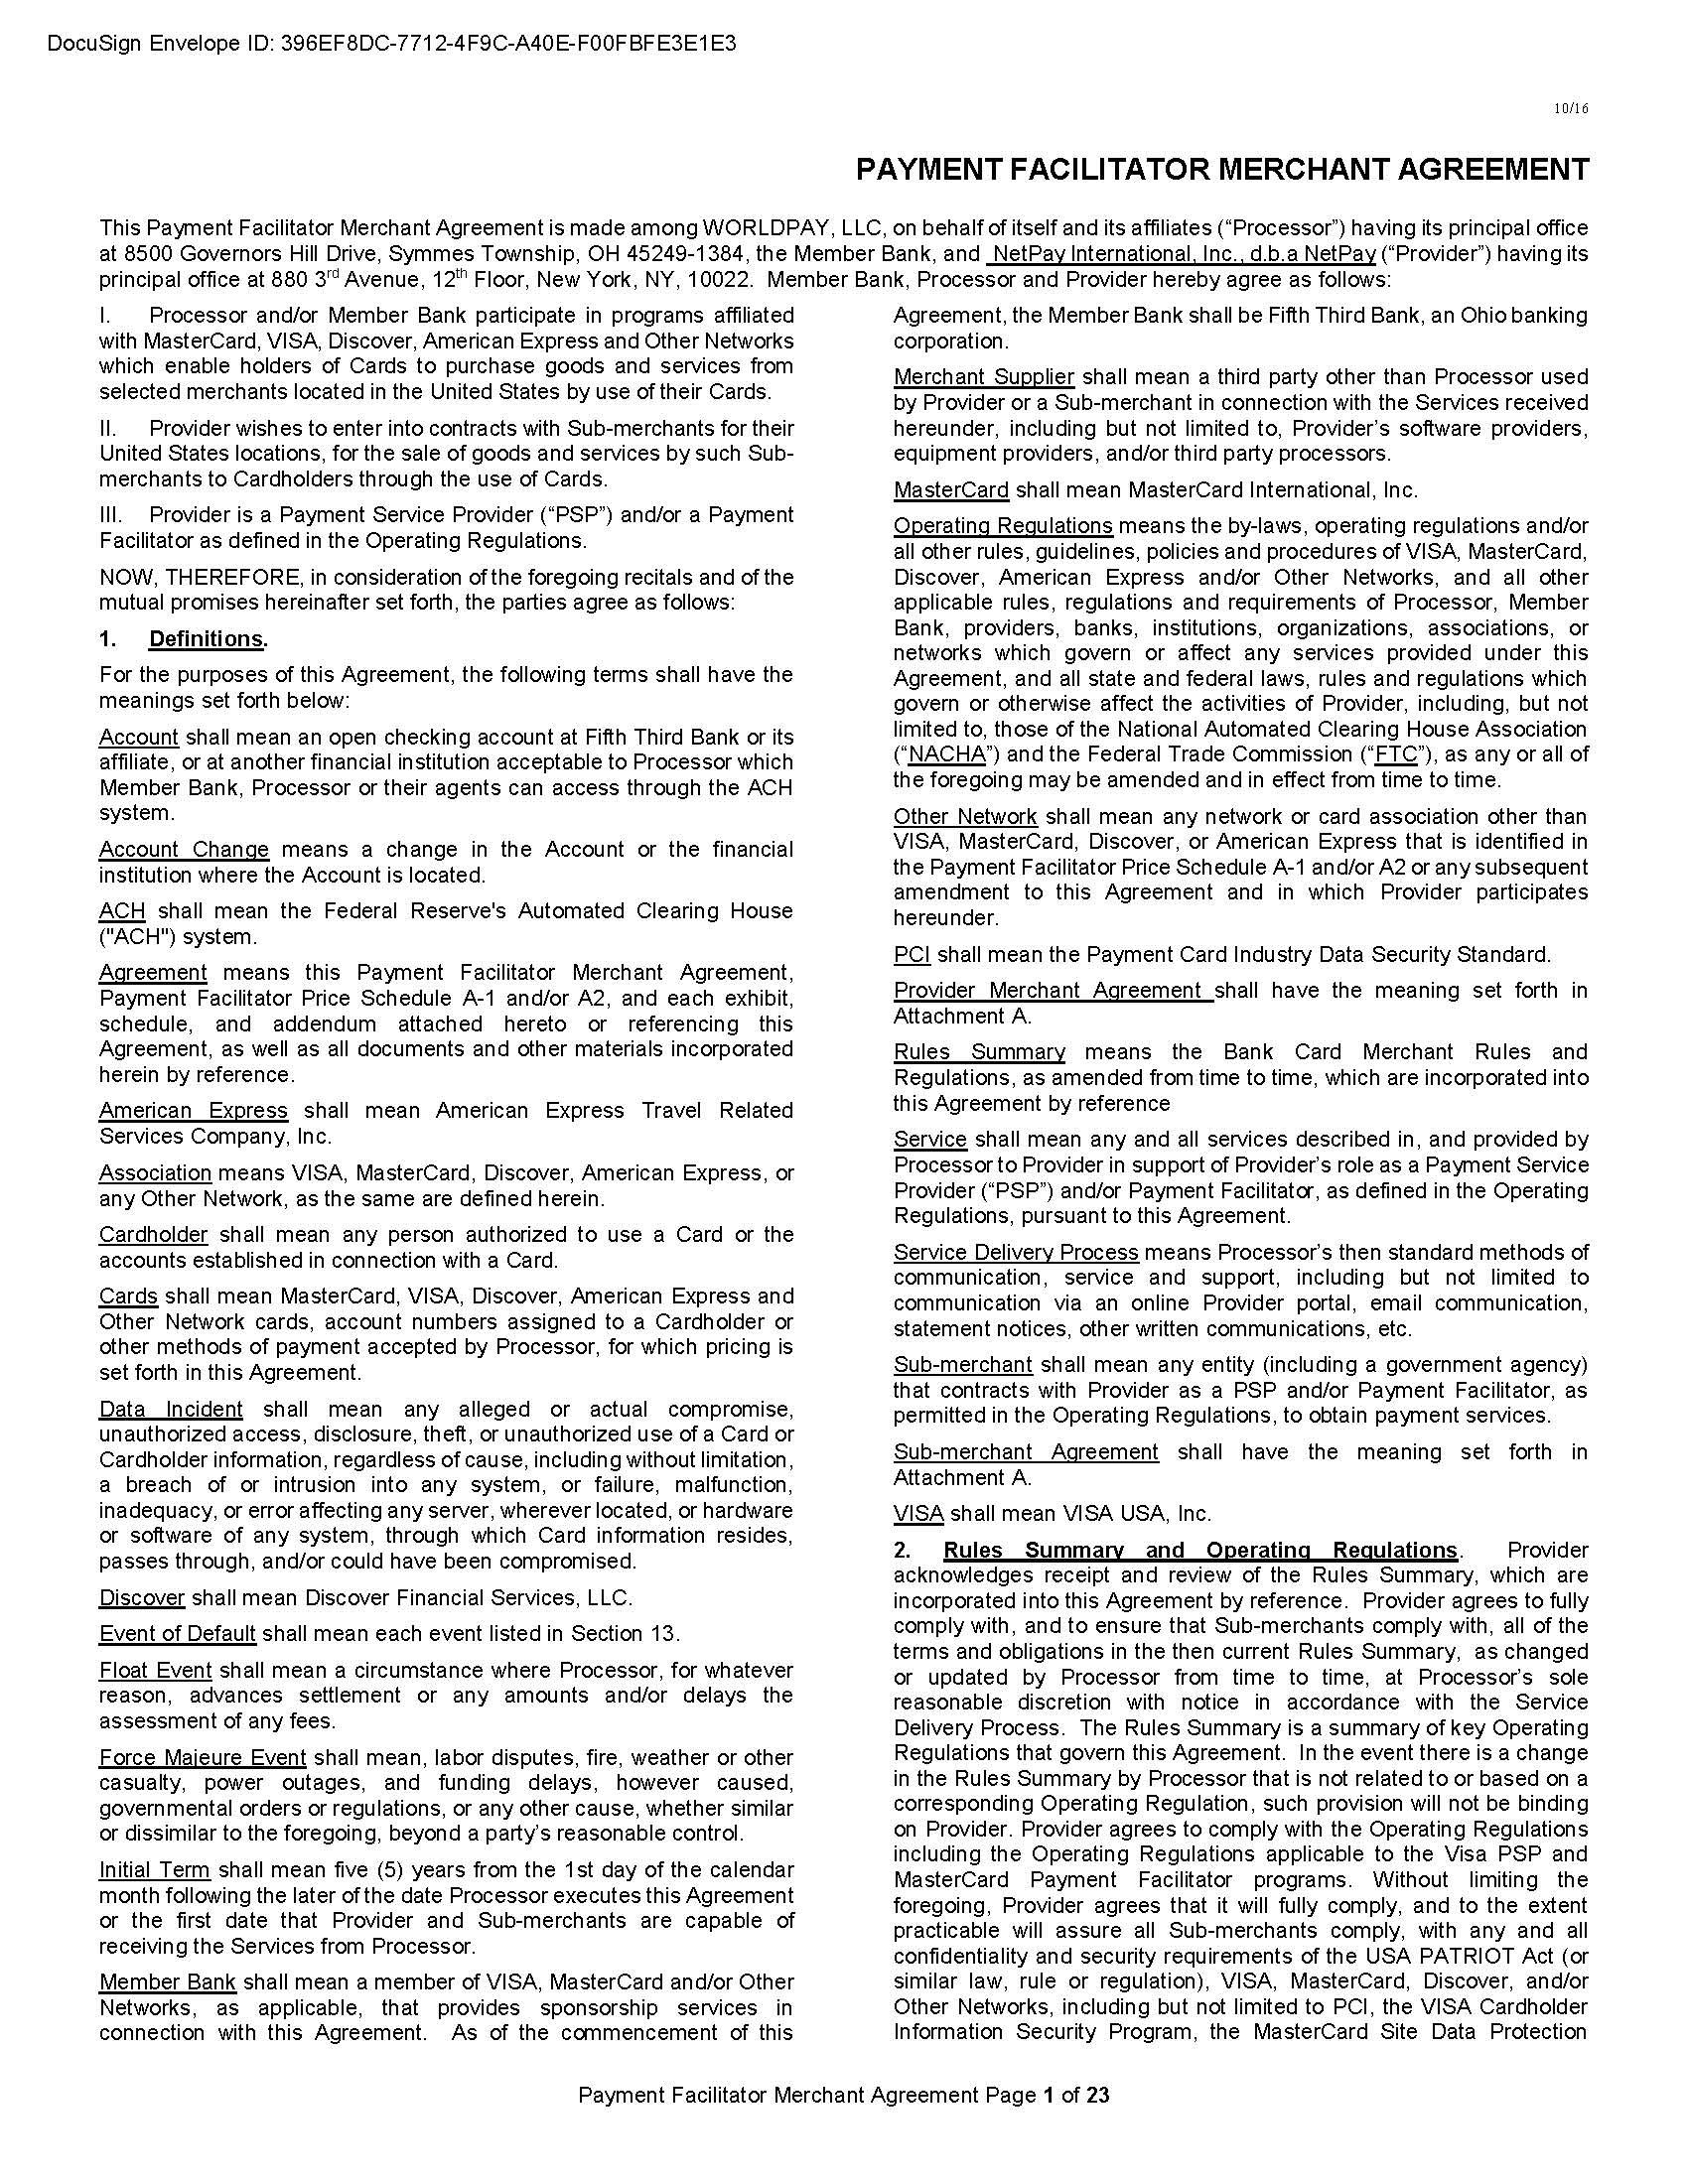 worldpay payment facilitator merchant agr 16 oct 2019_page_01.jpg